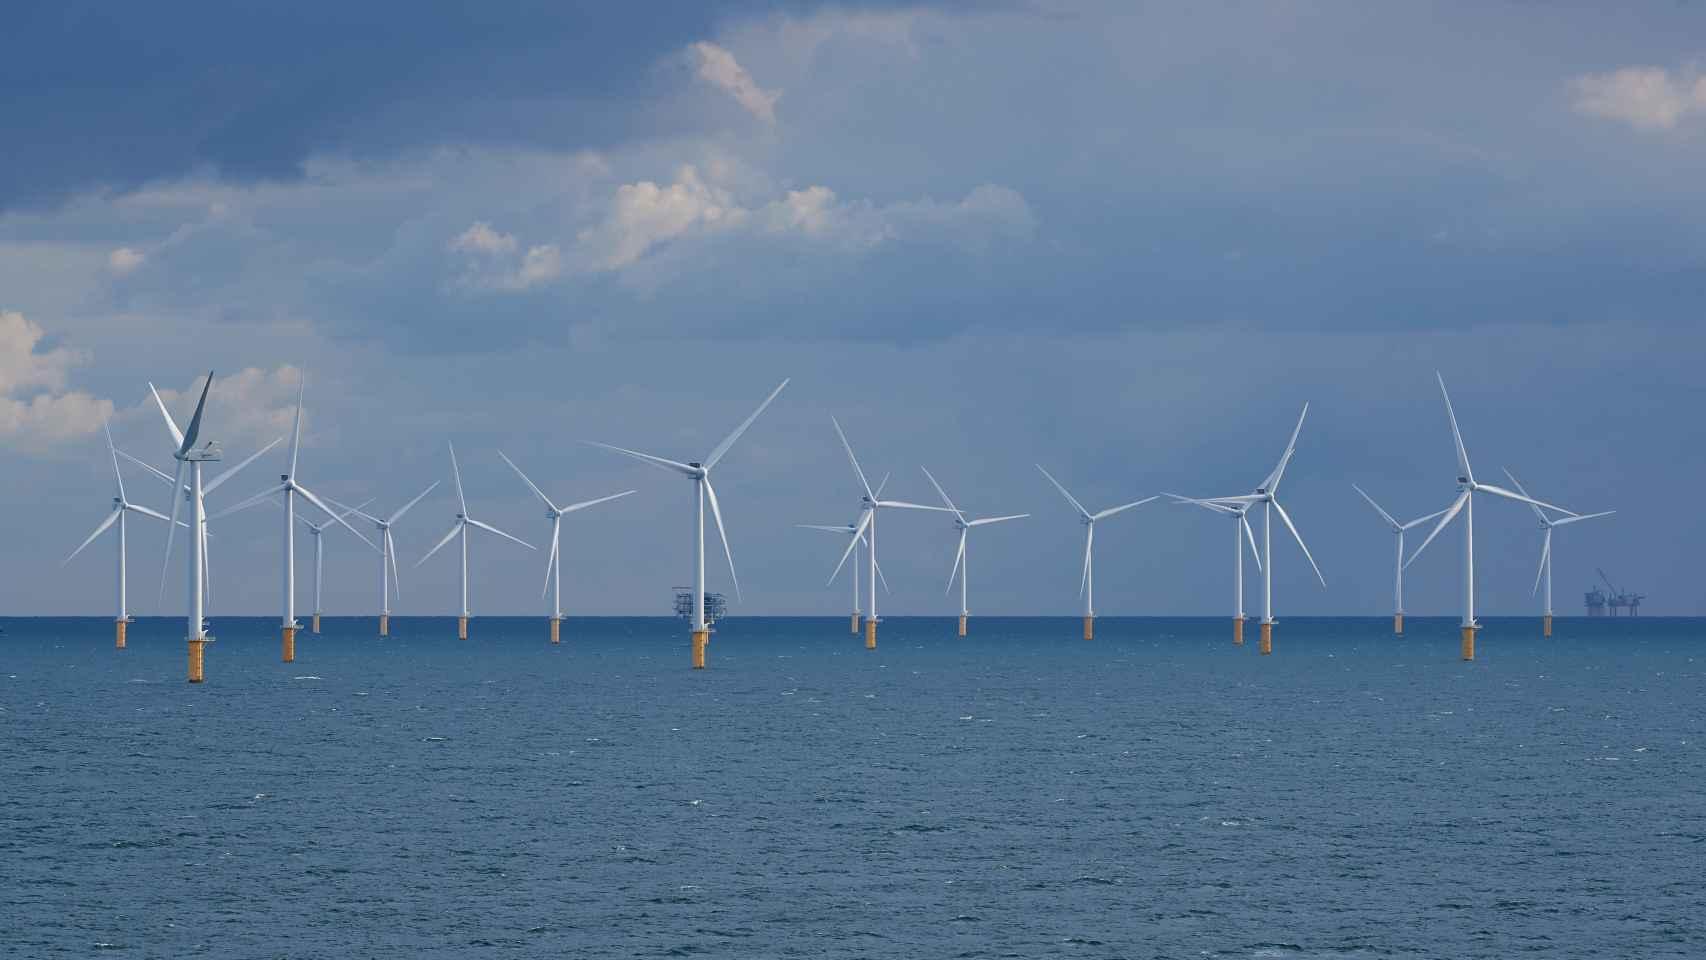 Naturgy abre la puerta a instalar un proyecto piloto de eólica marina en España